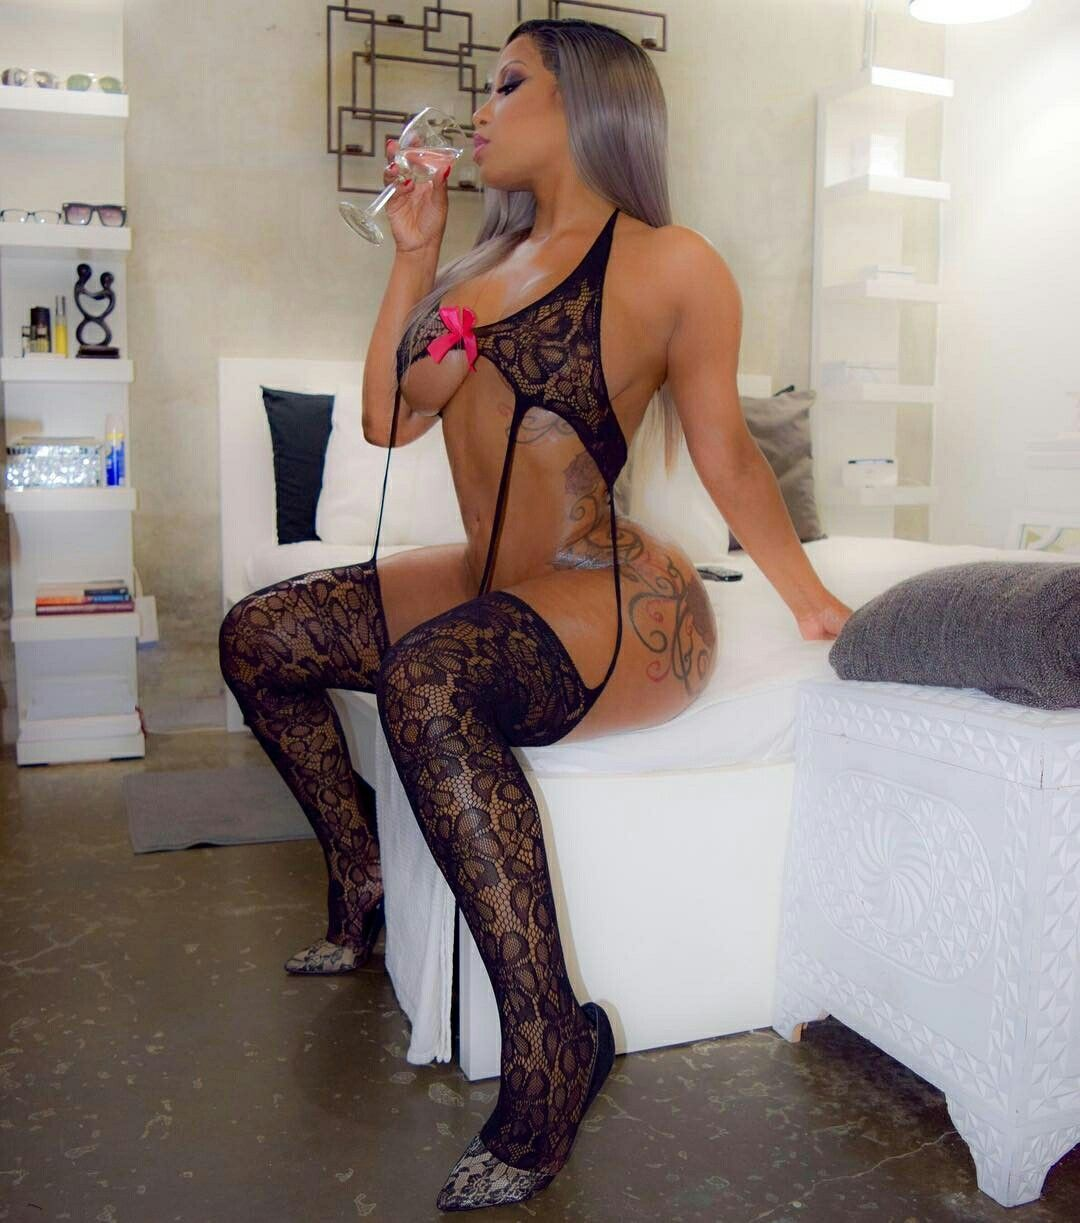 irene the dream nude pic